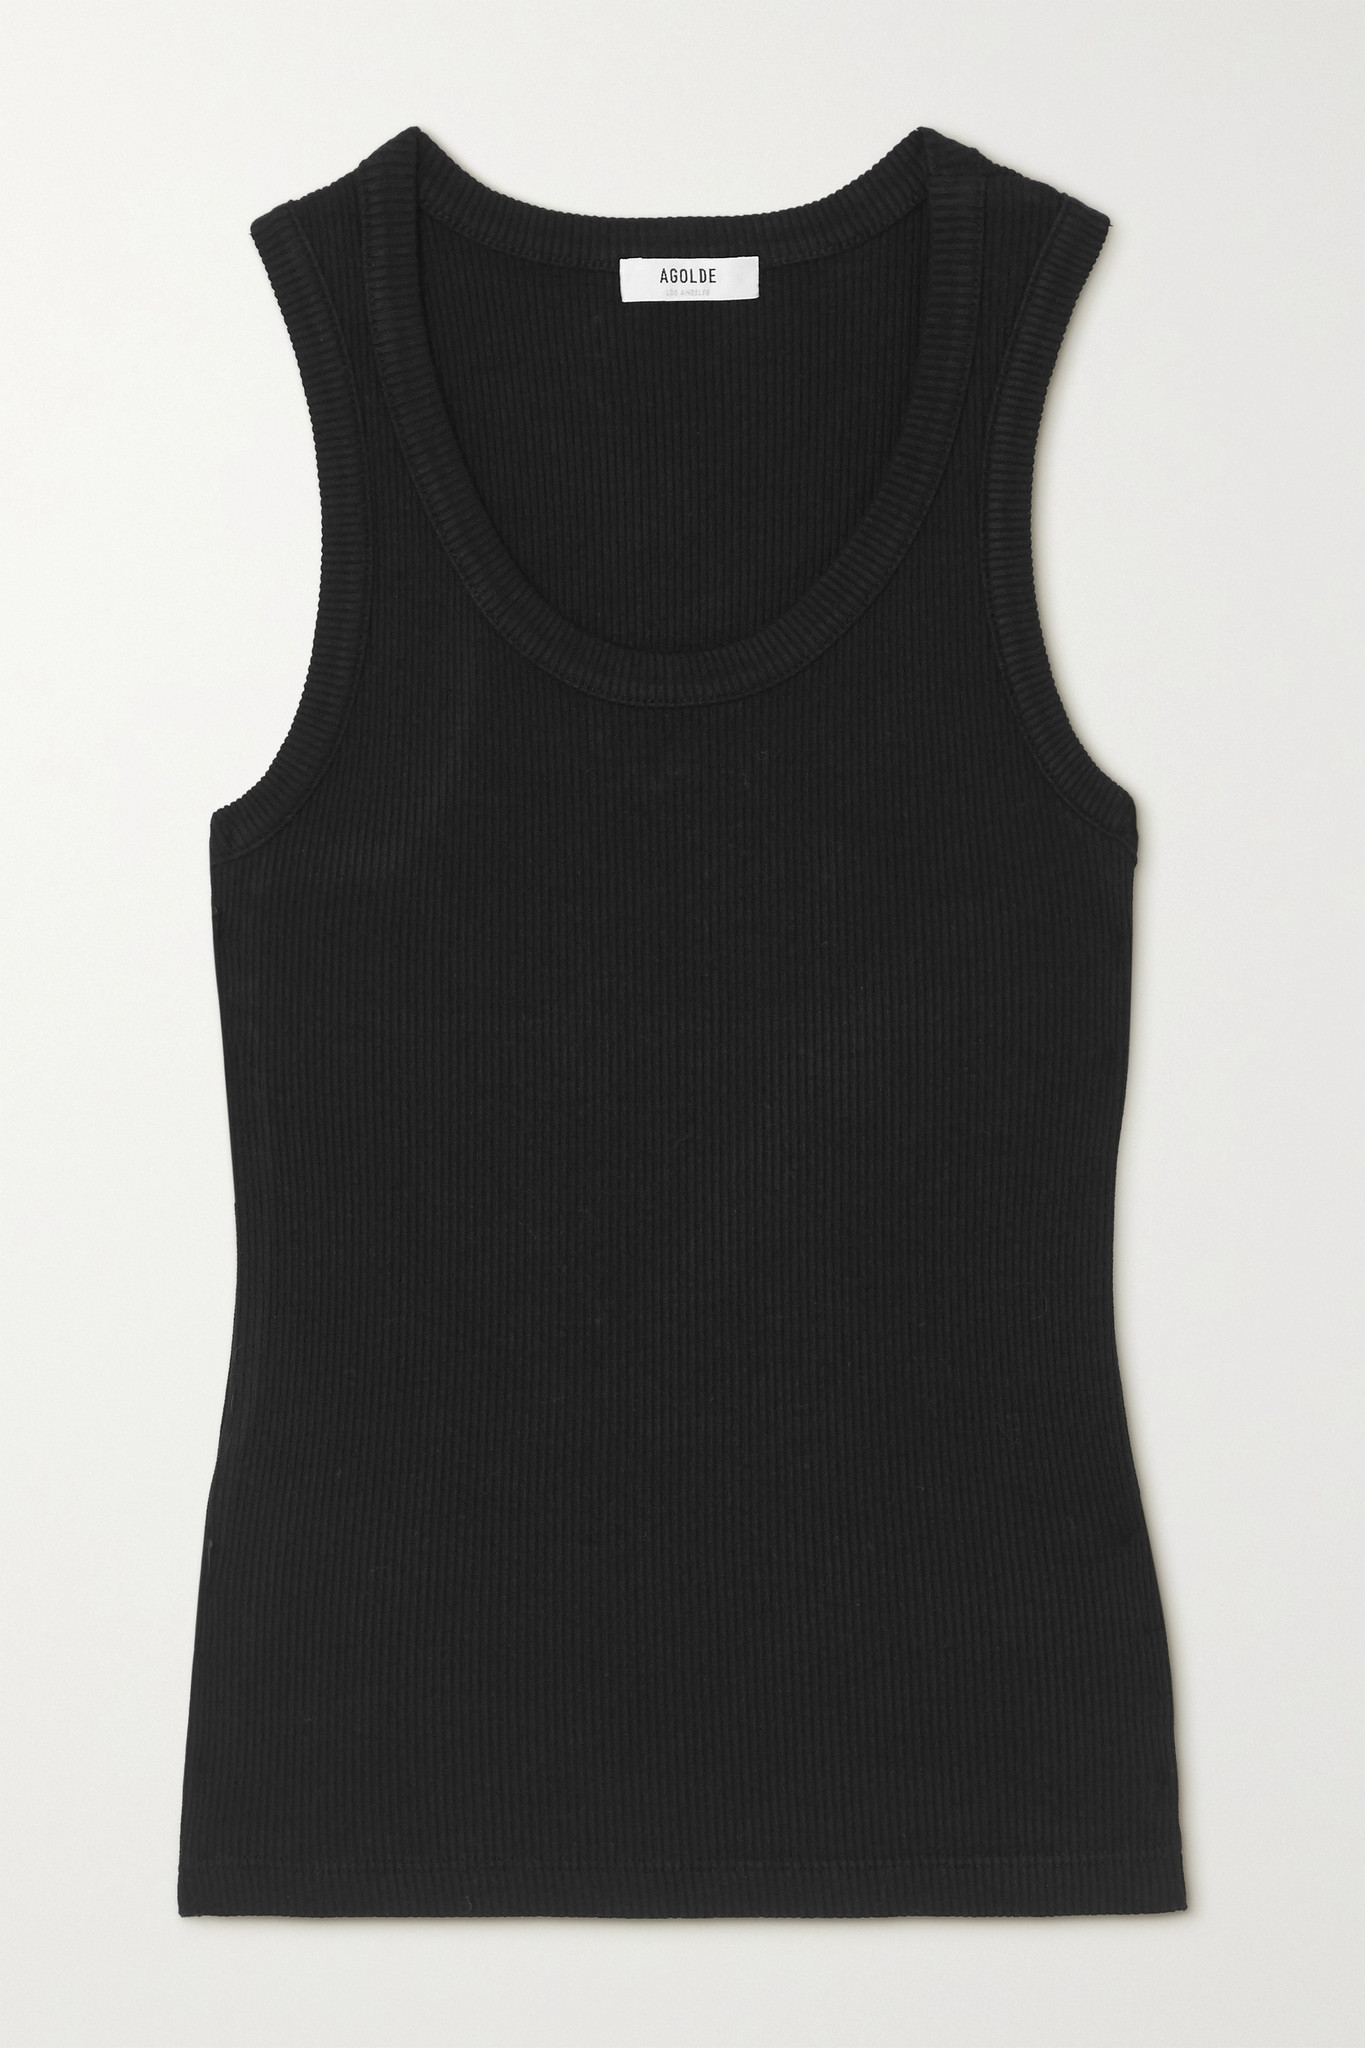 AGOLDE - Poppy 罗纹弹力有机棉质天丝混纺平纹布坦克背心 - 黑色 - x small